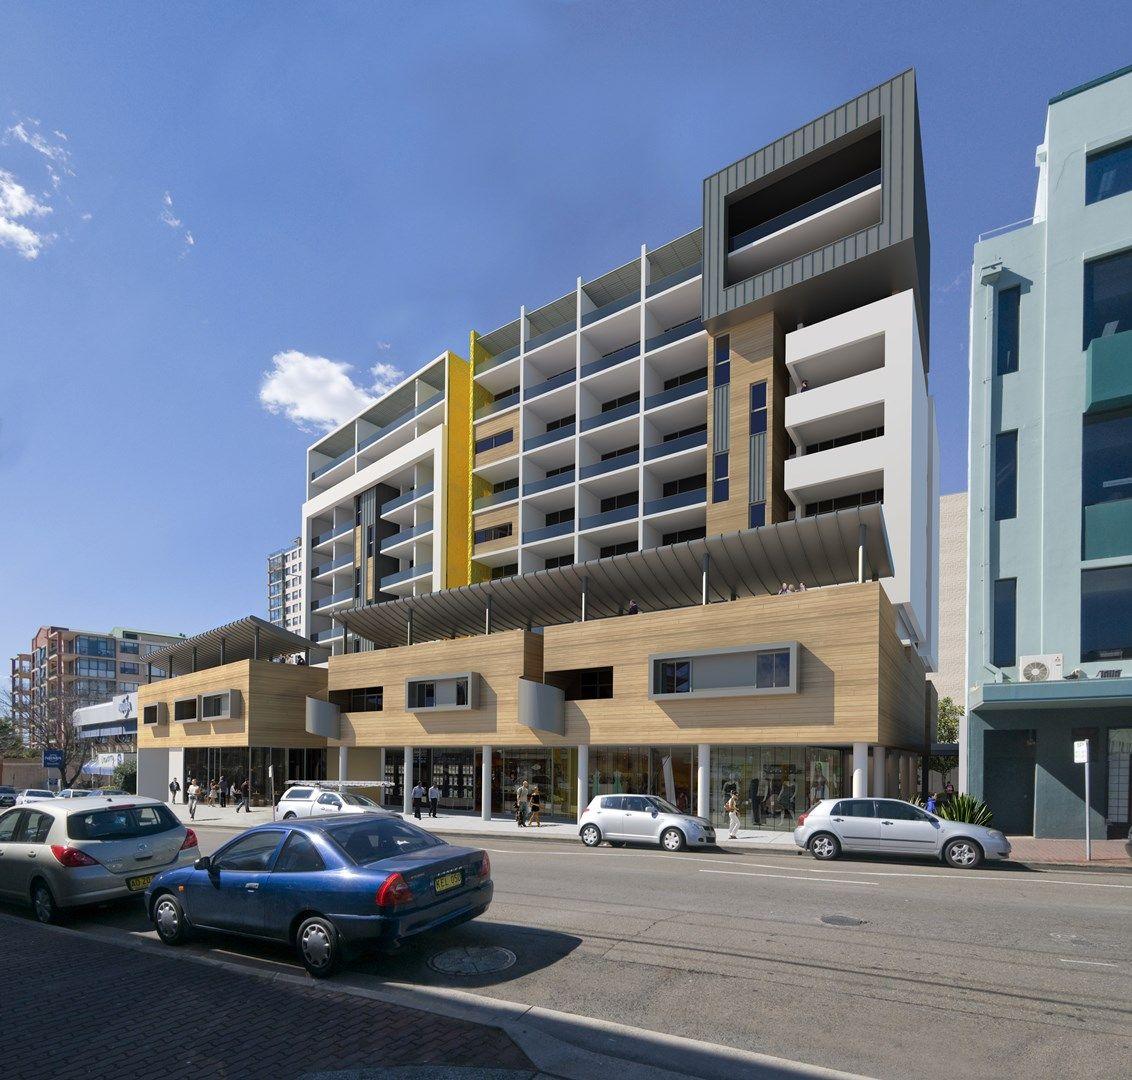 110/11-17 Woodville Street, Hurstville NSW 2220, Image 0